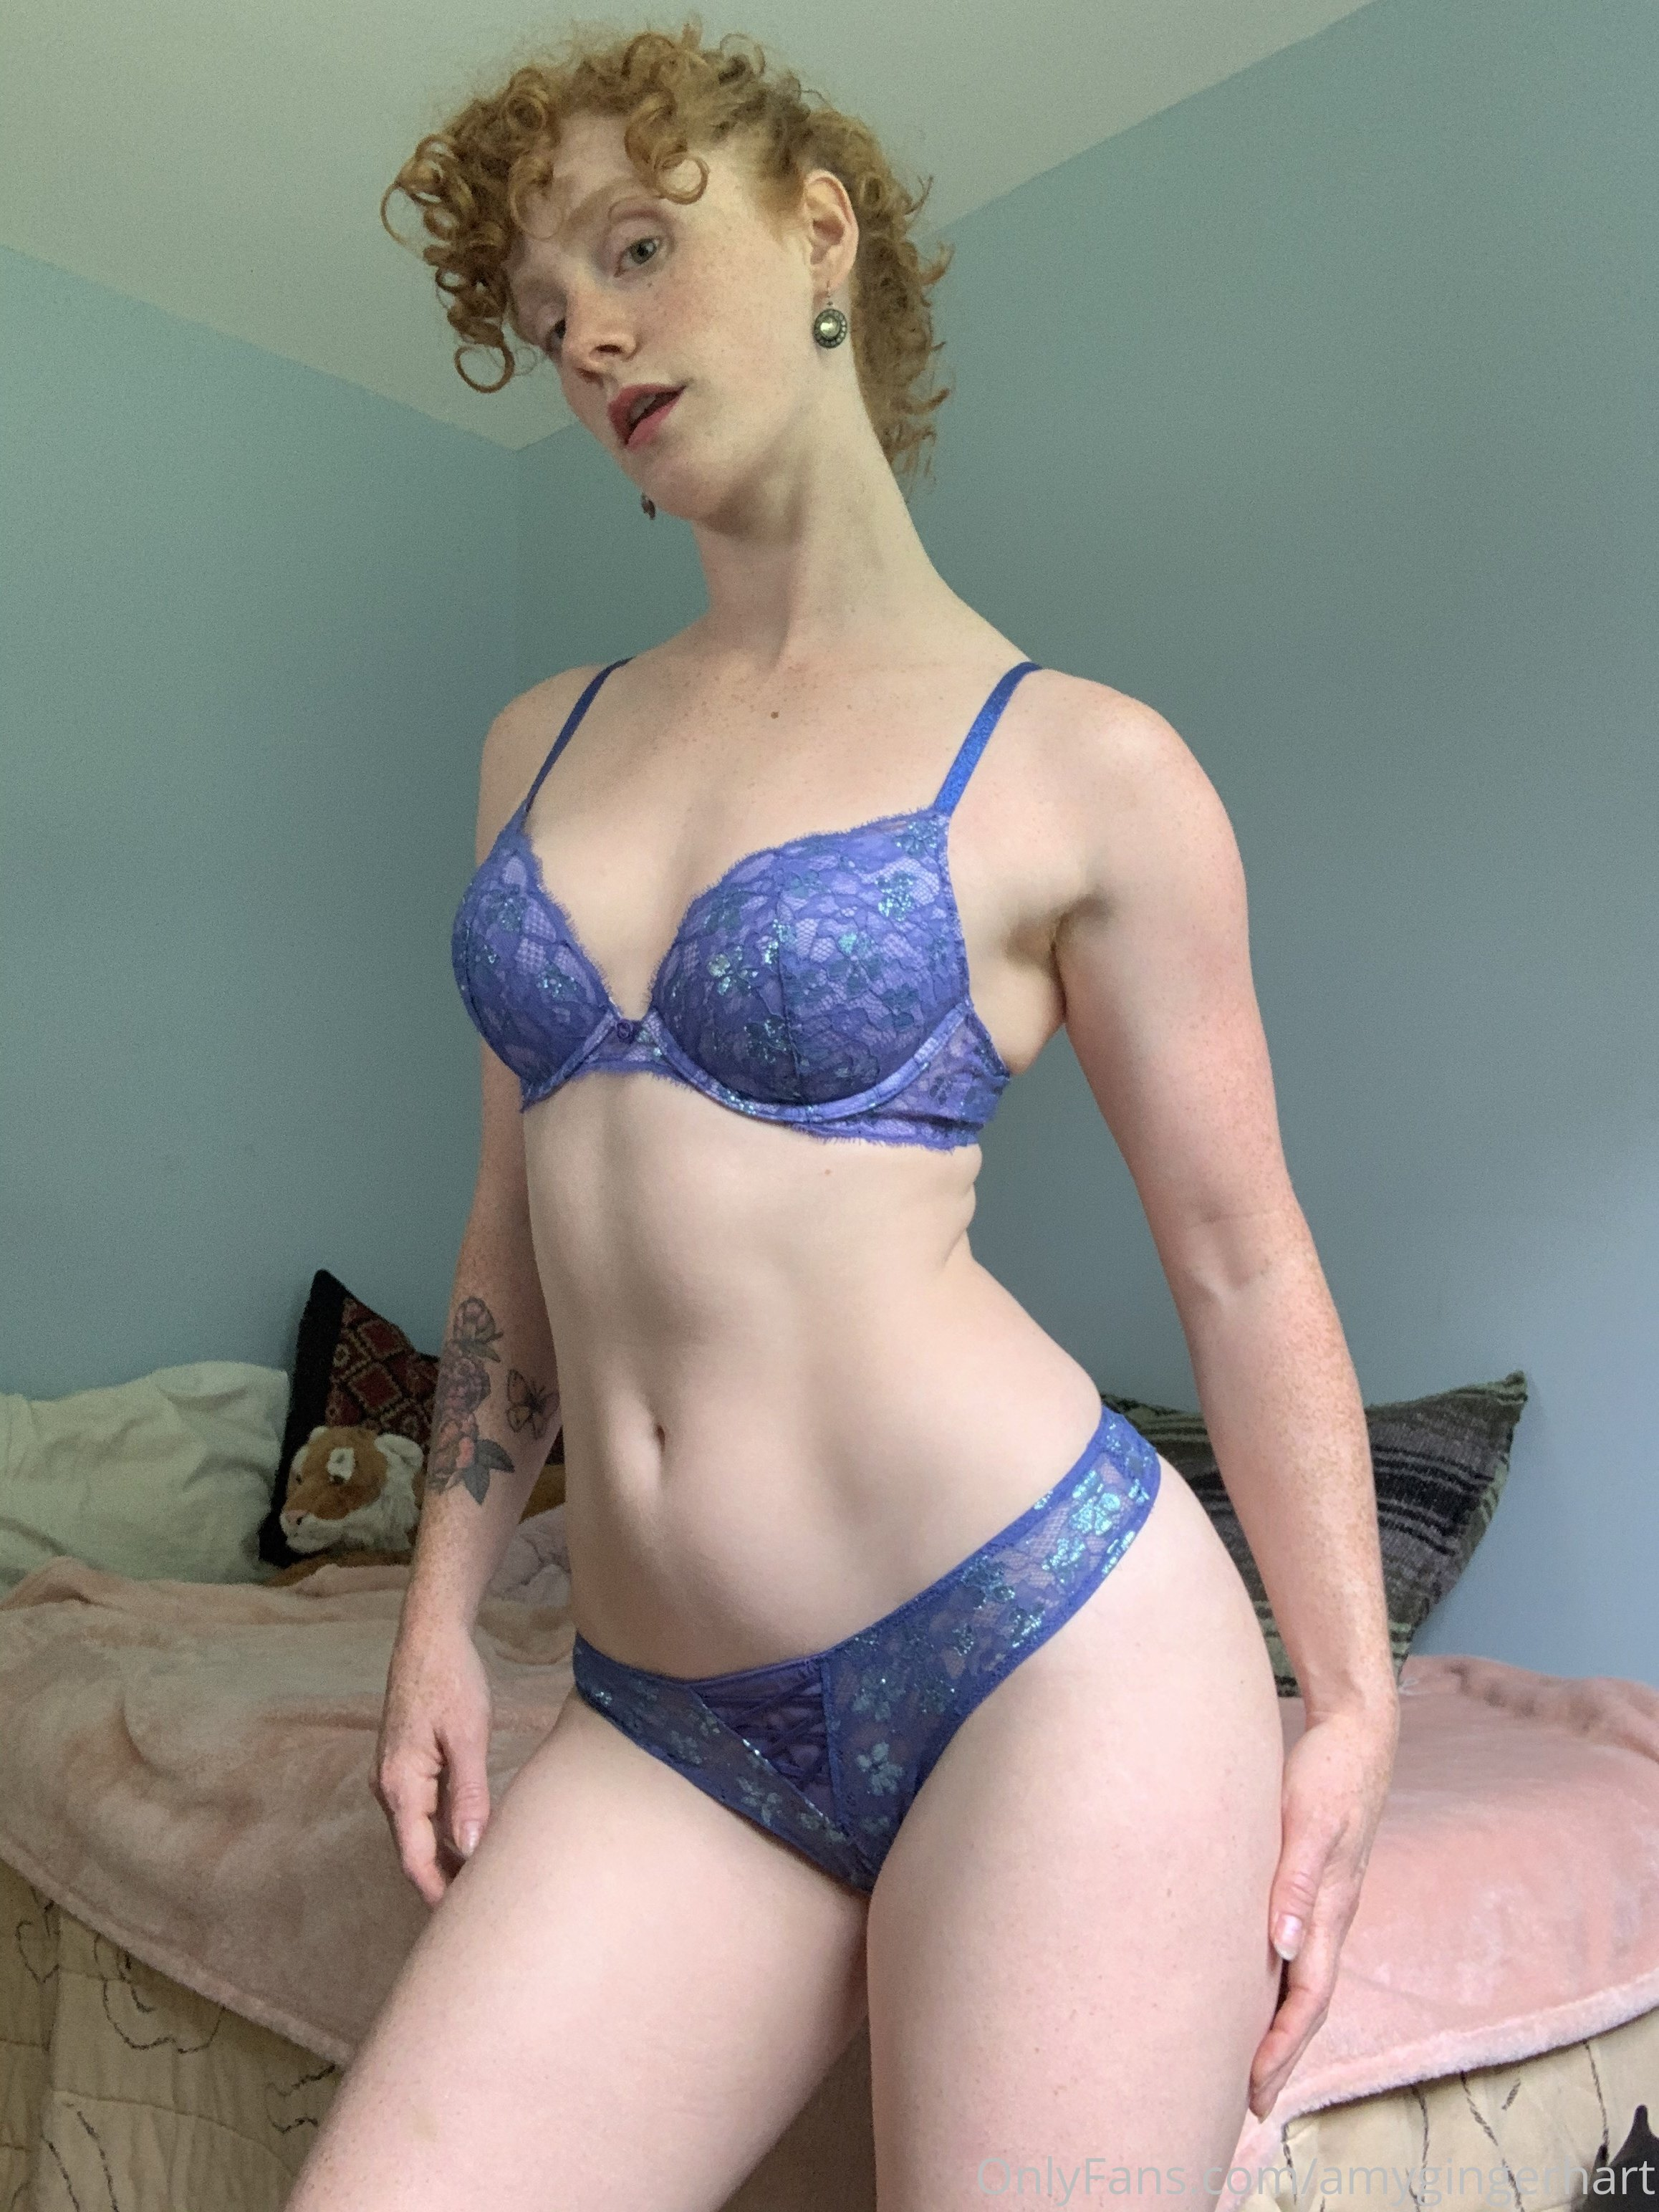 Amy Hart, Amygingerhart, Onlyfans 0294